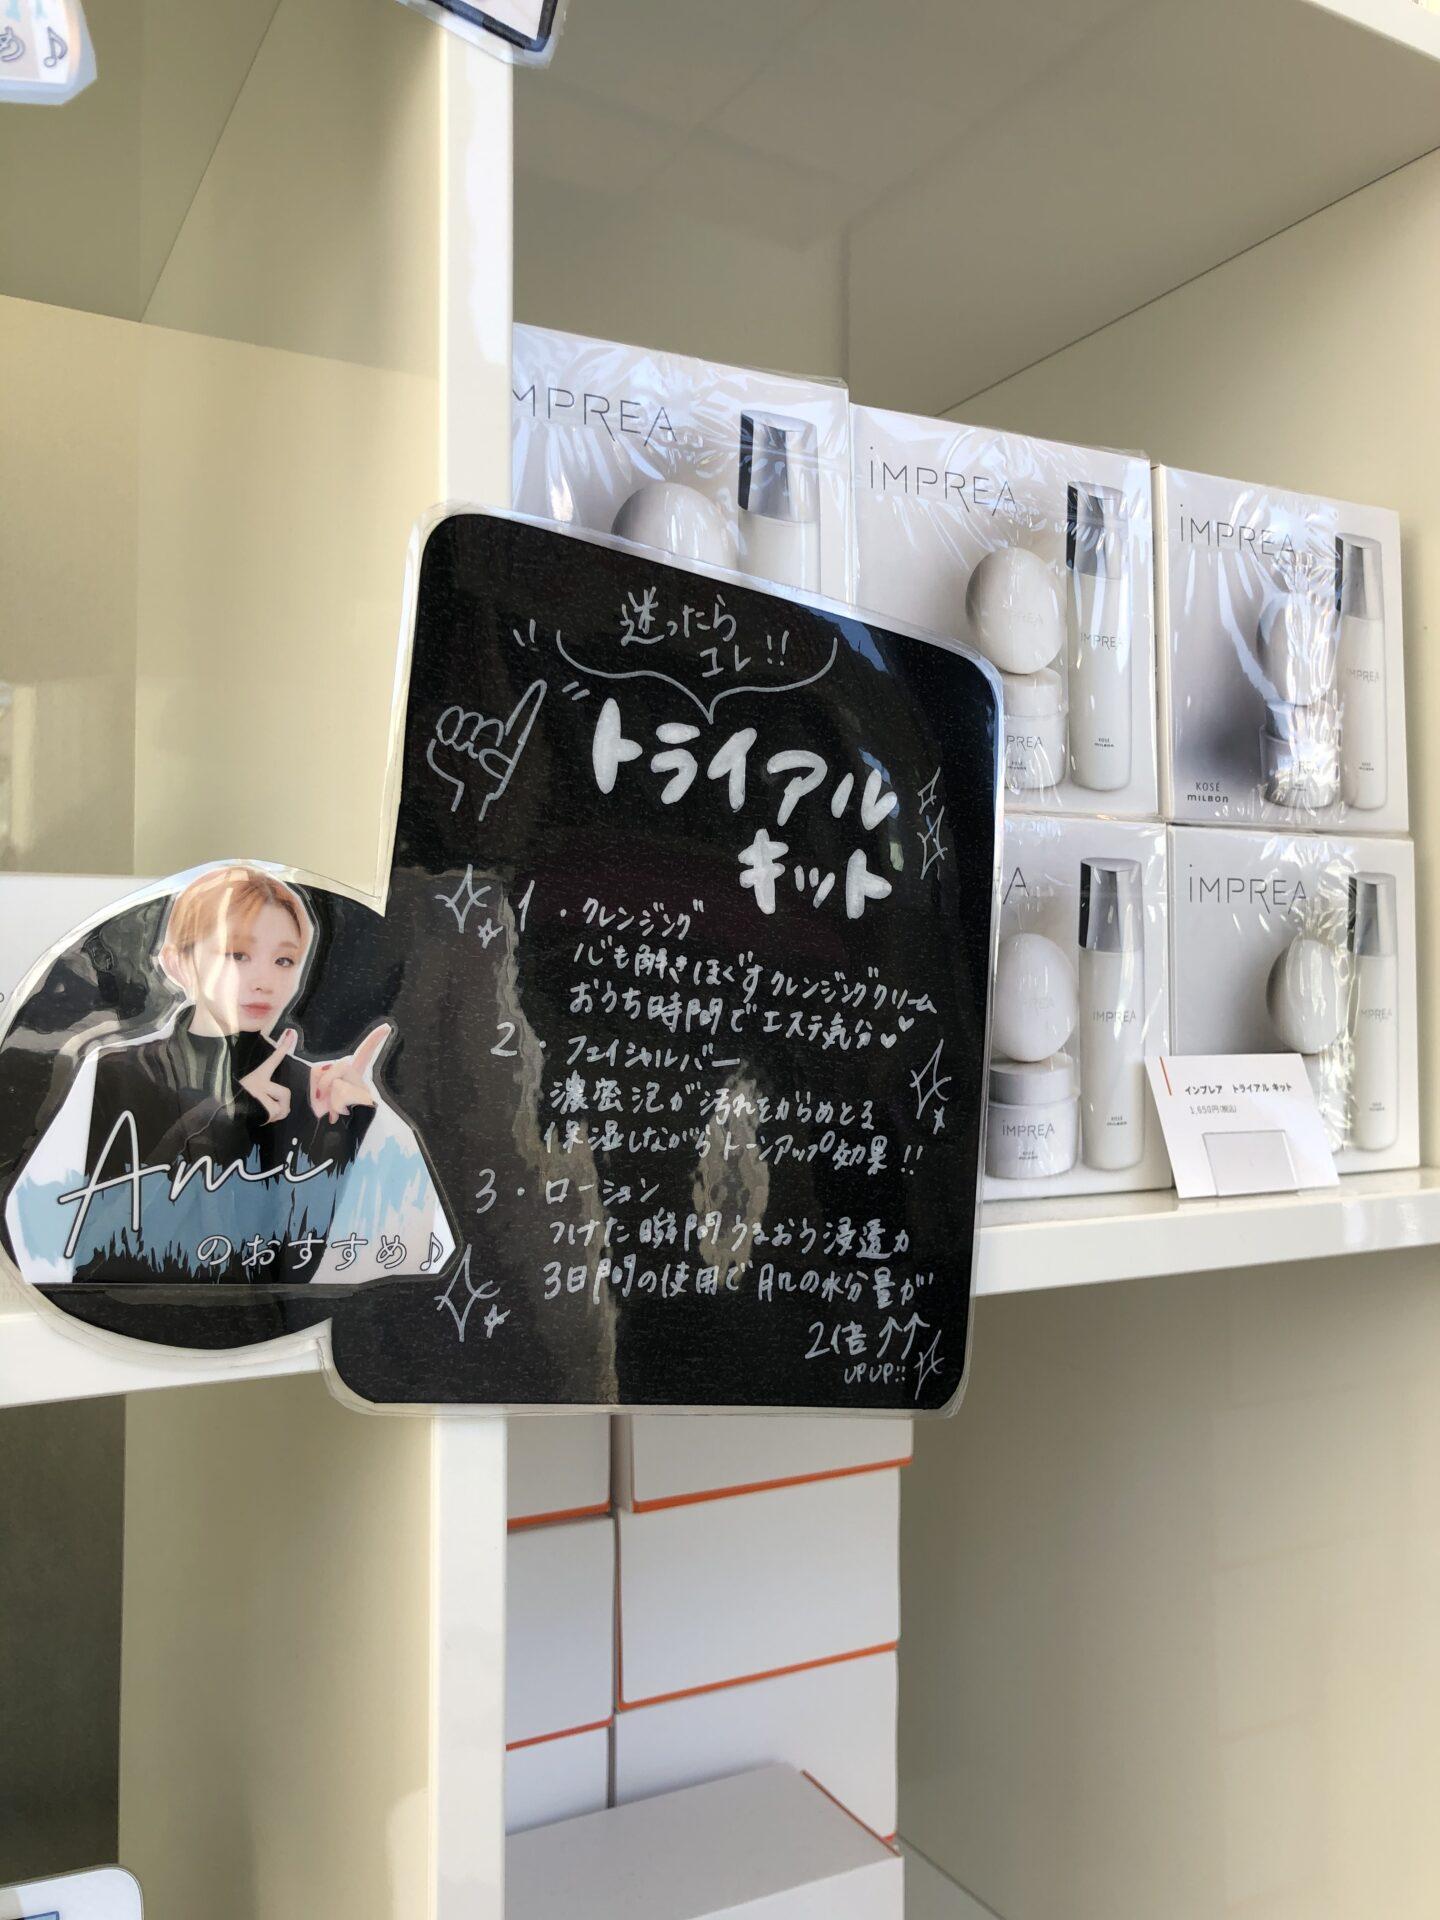 DIFINO aoyama 女性美容師おすすめインプレア商品♪